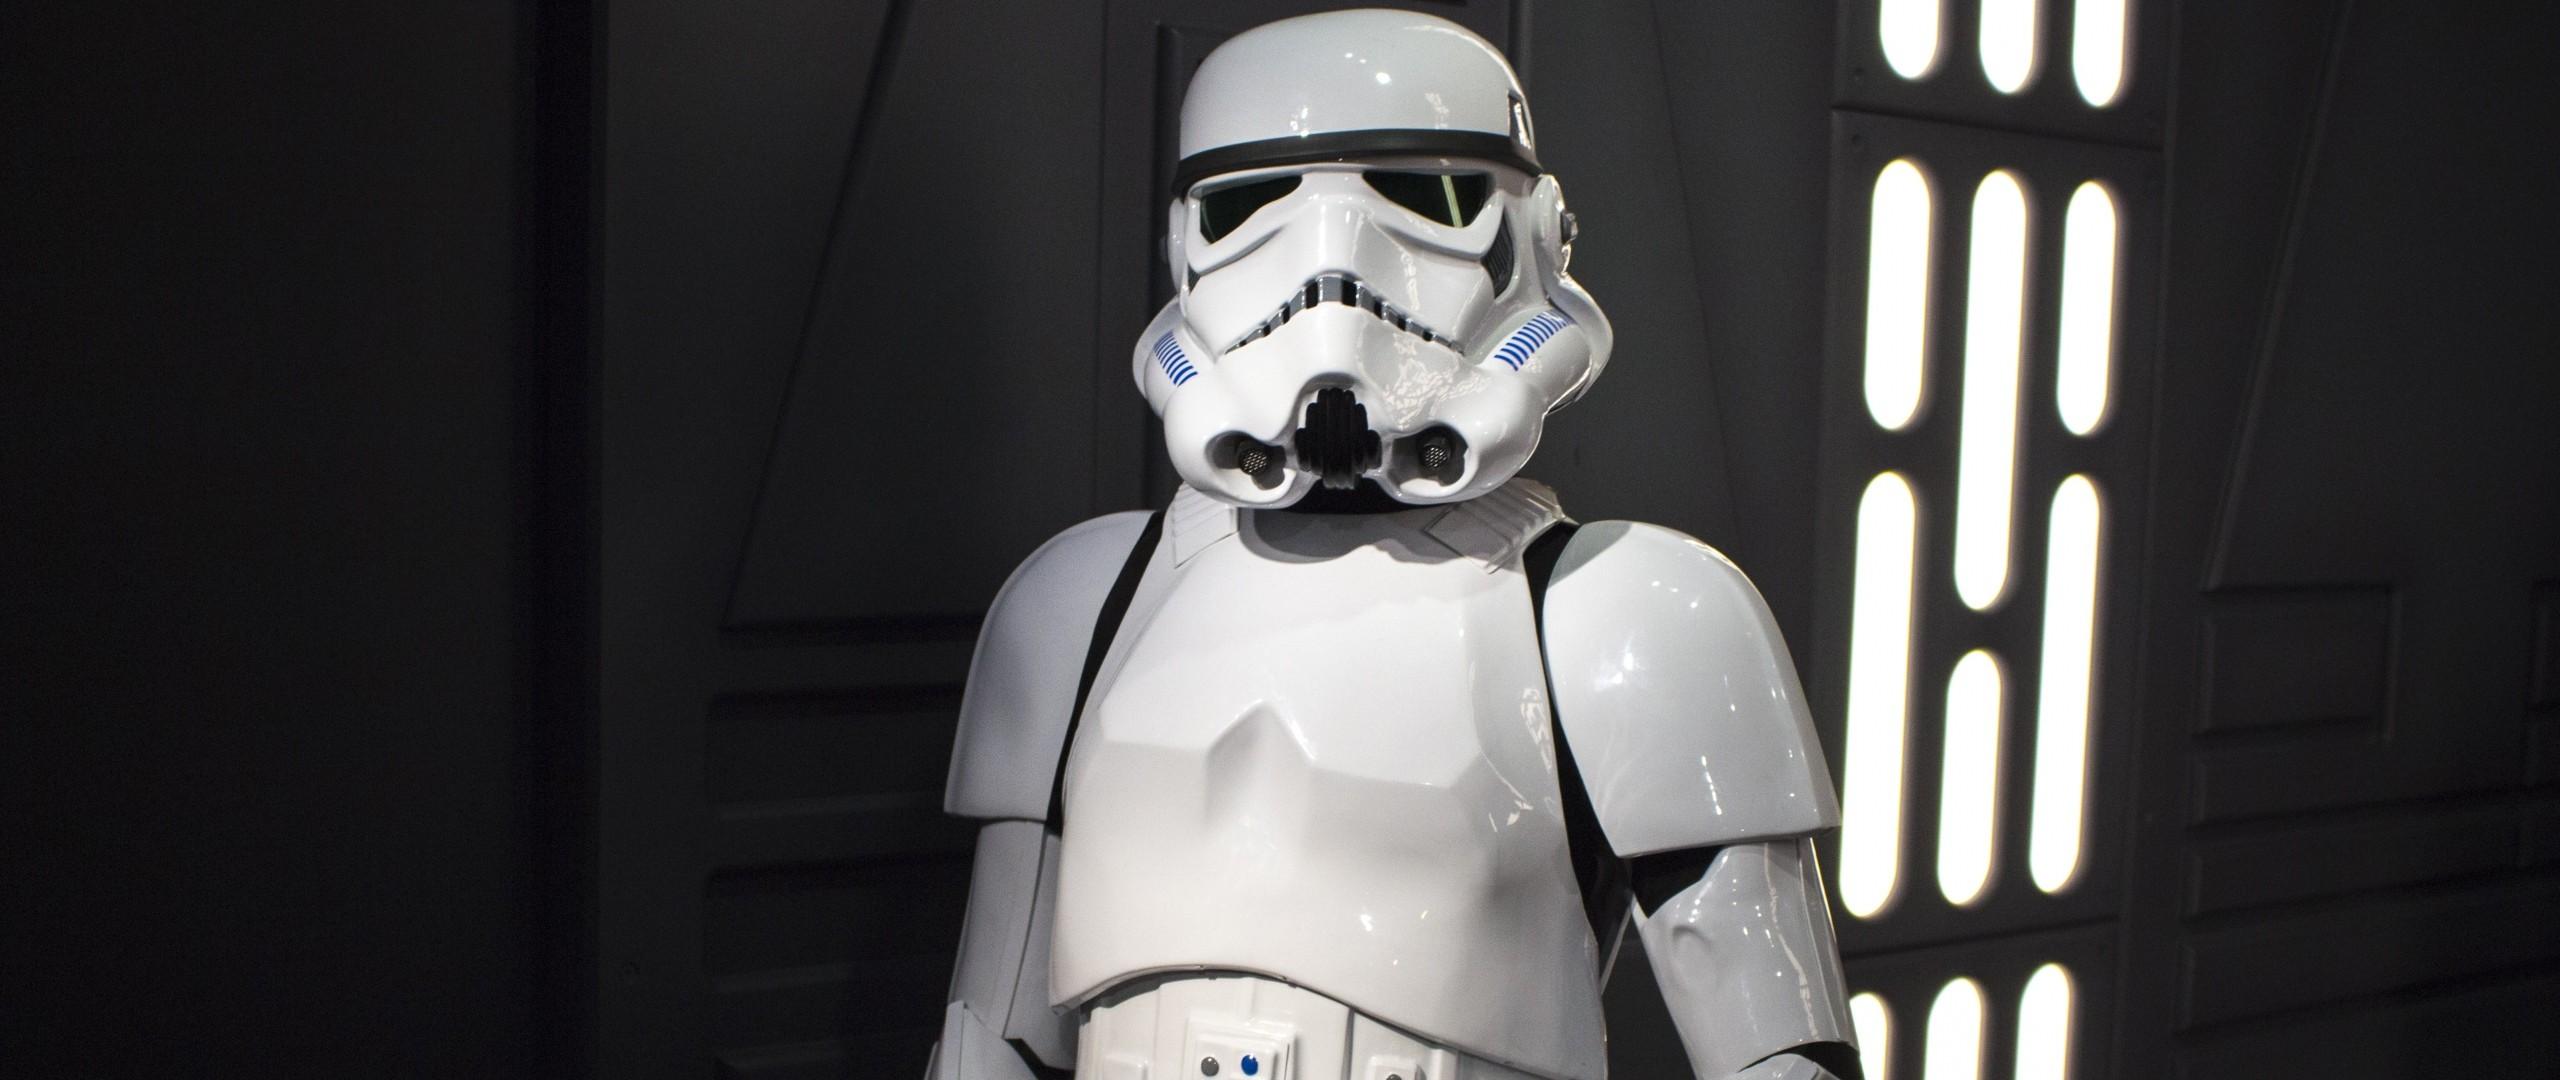 Wallpaper stormtroopers, toy, star wars